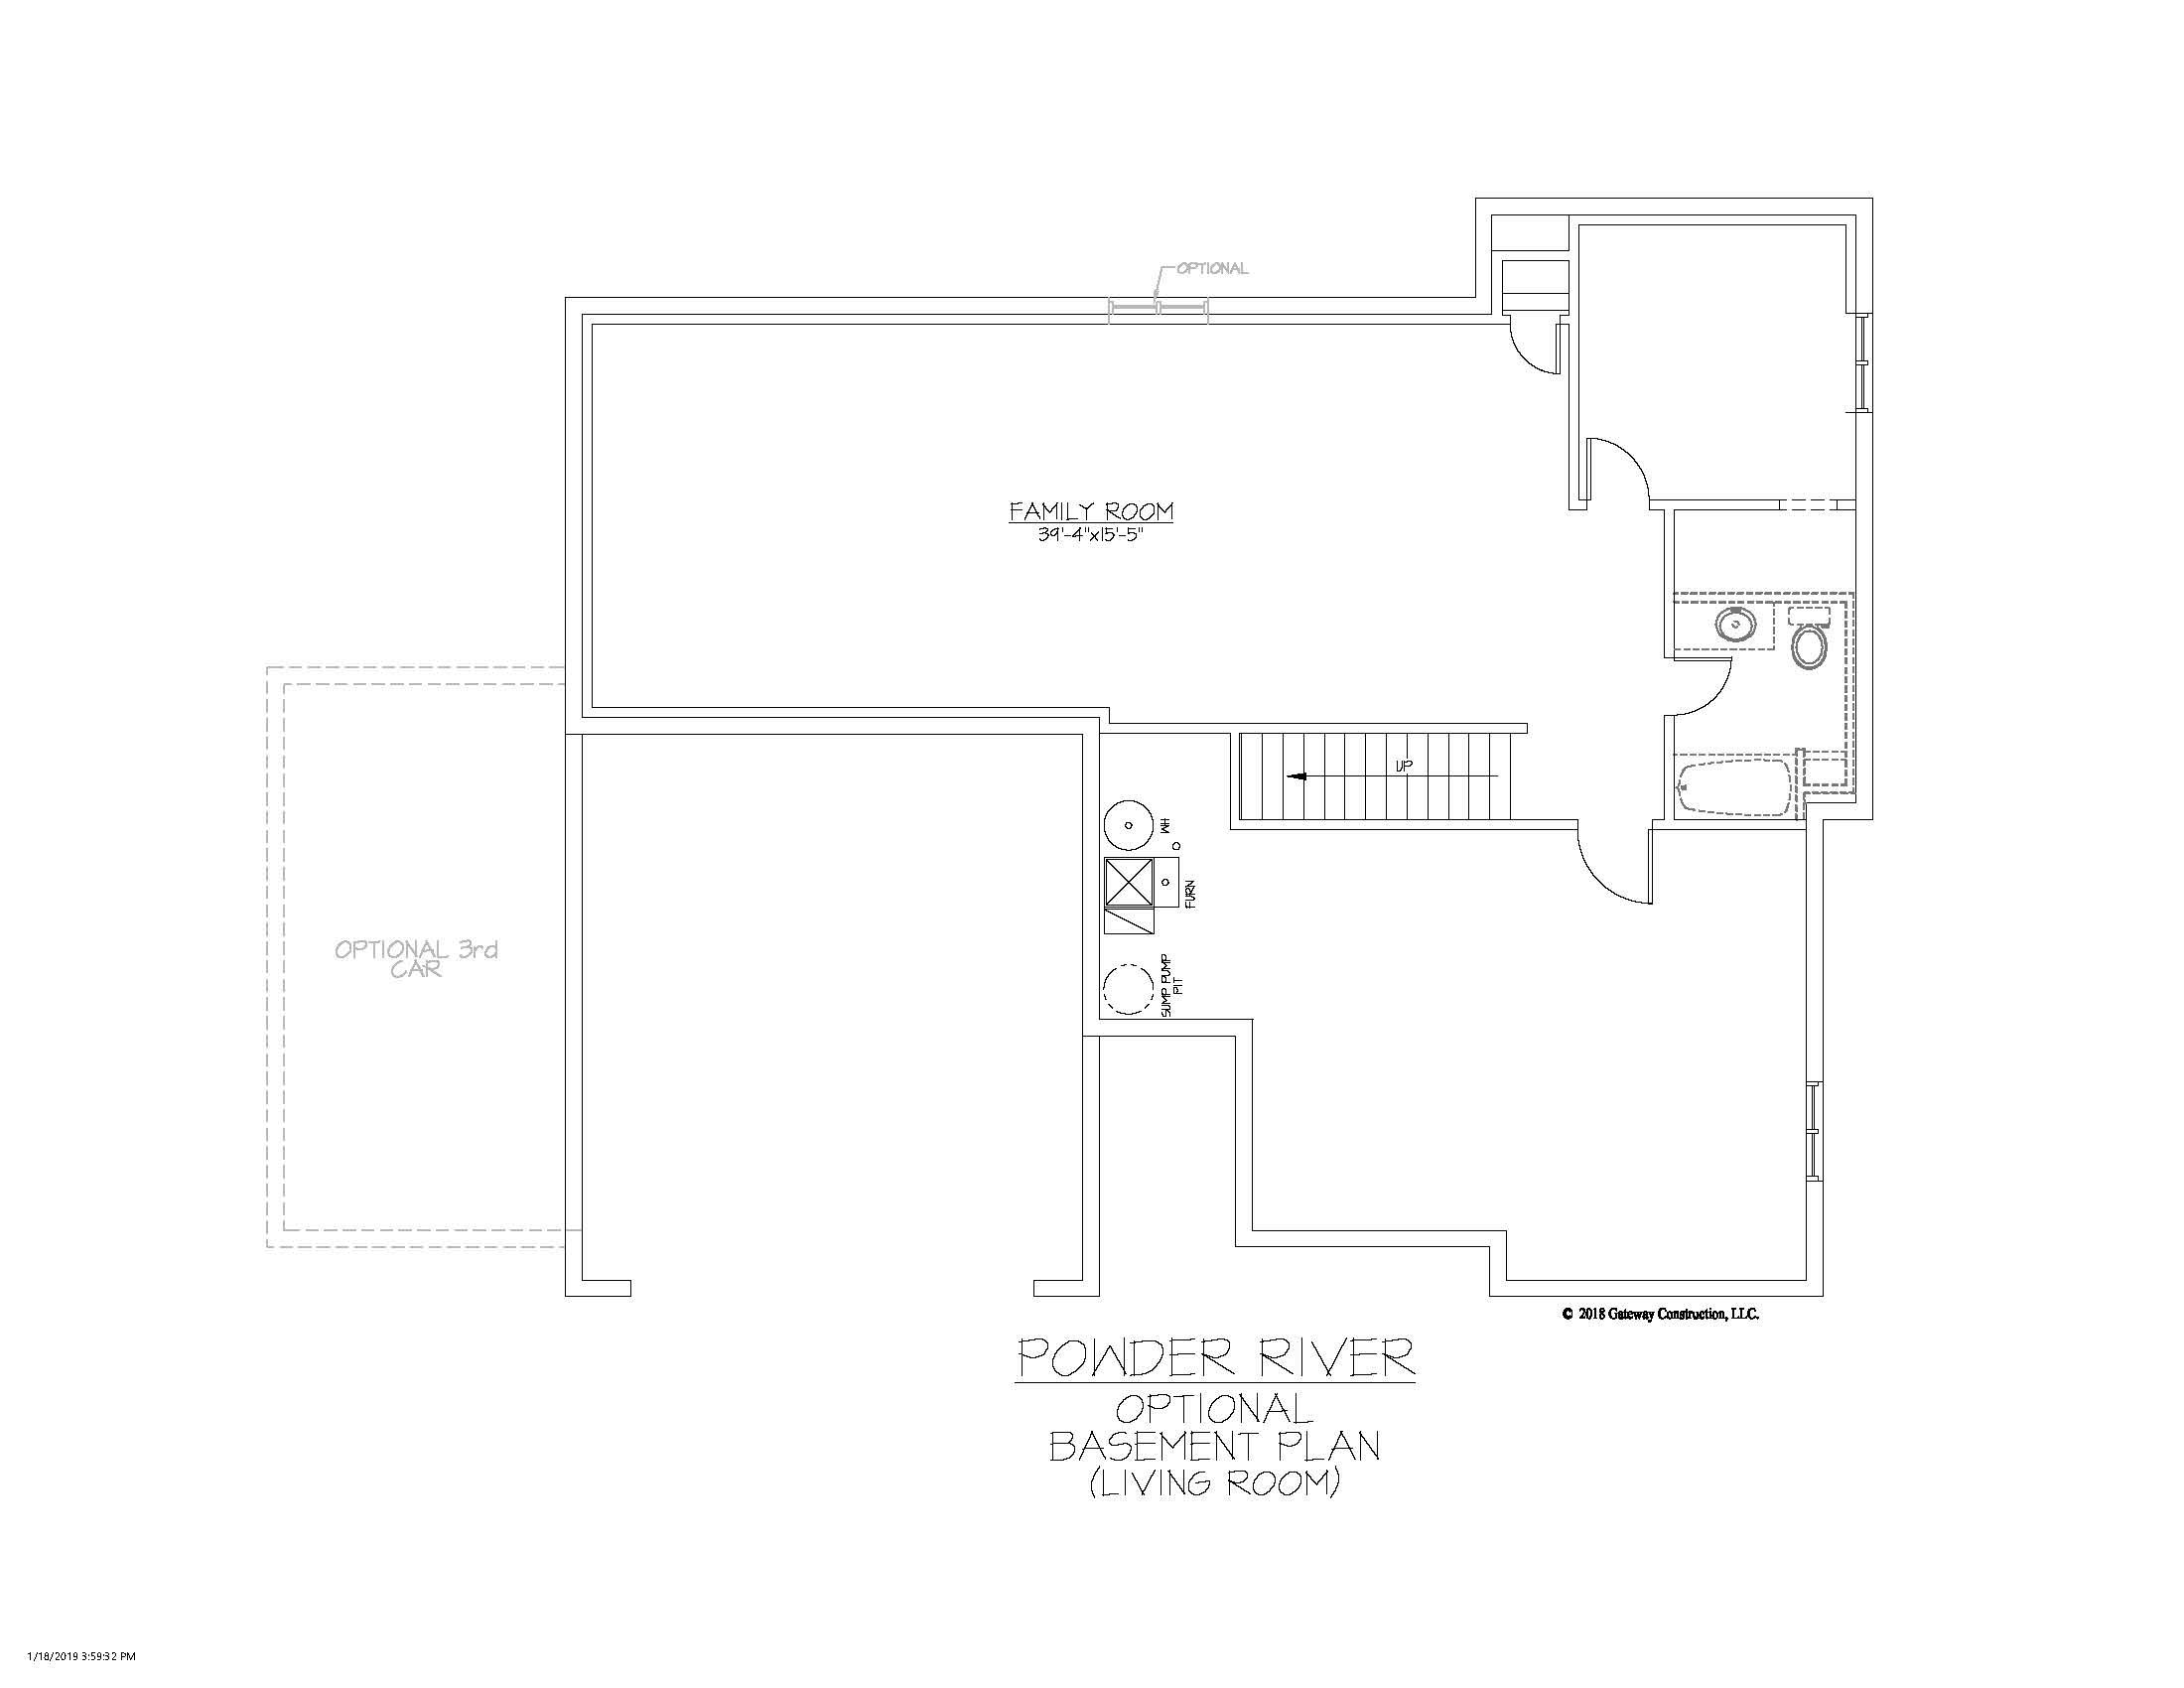 Powder River GL Basement Living Room Finish